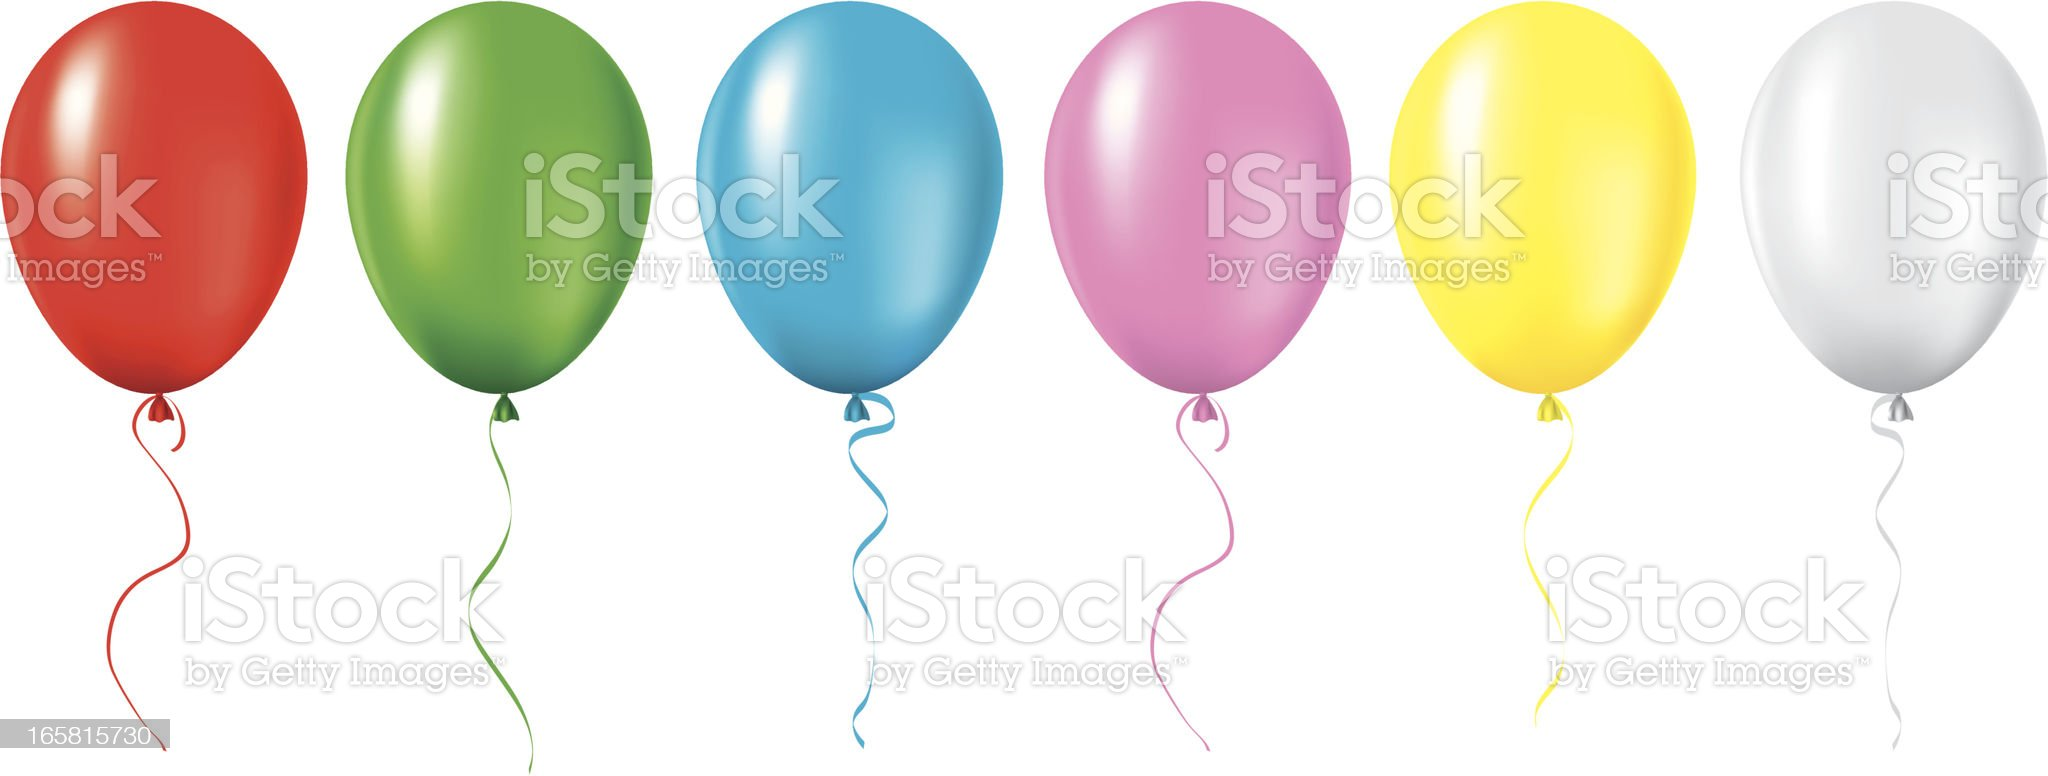 Air Balloons royalty-free stock vector art